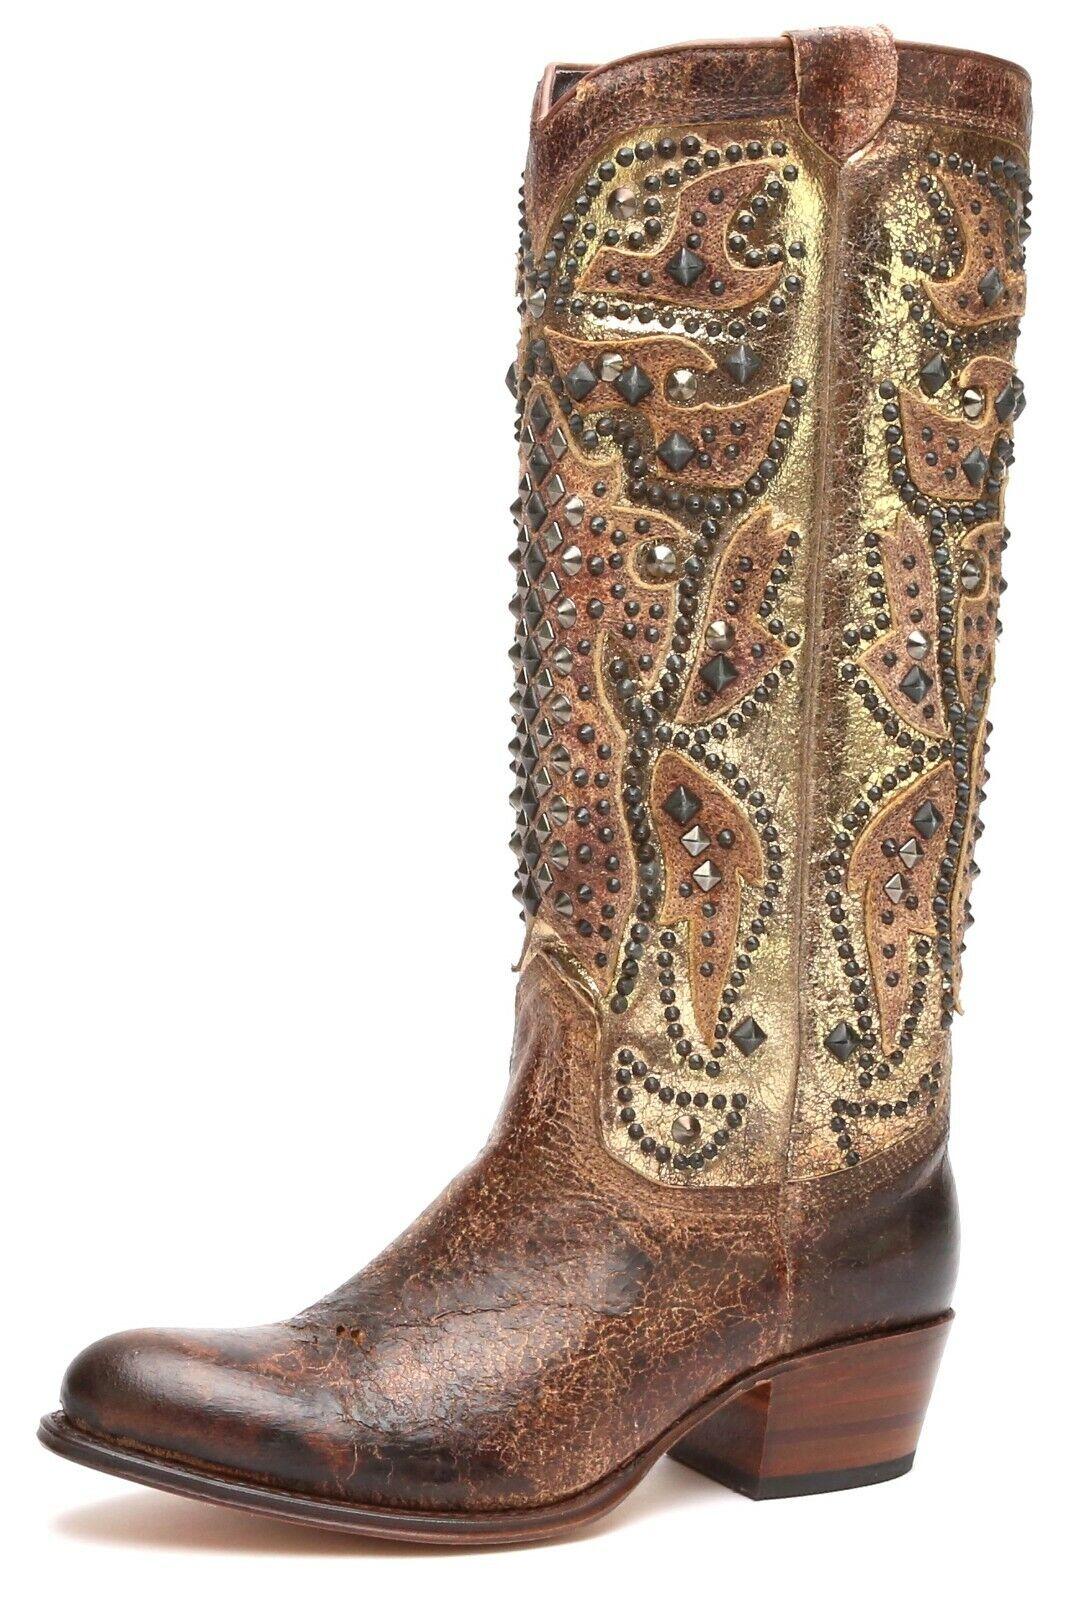 Frye Deborah Womens Deco Tall Whiskey Studded Cowboy Boots 2007 Size 7